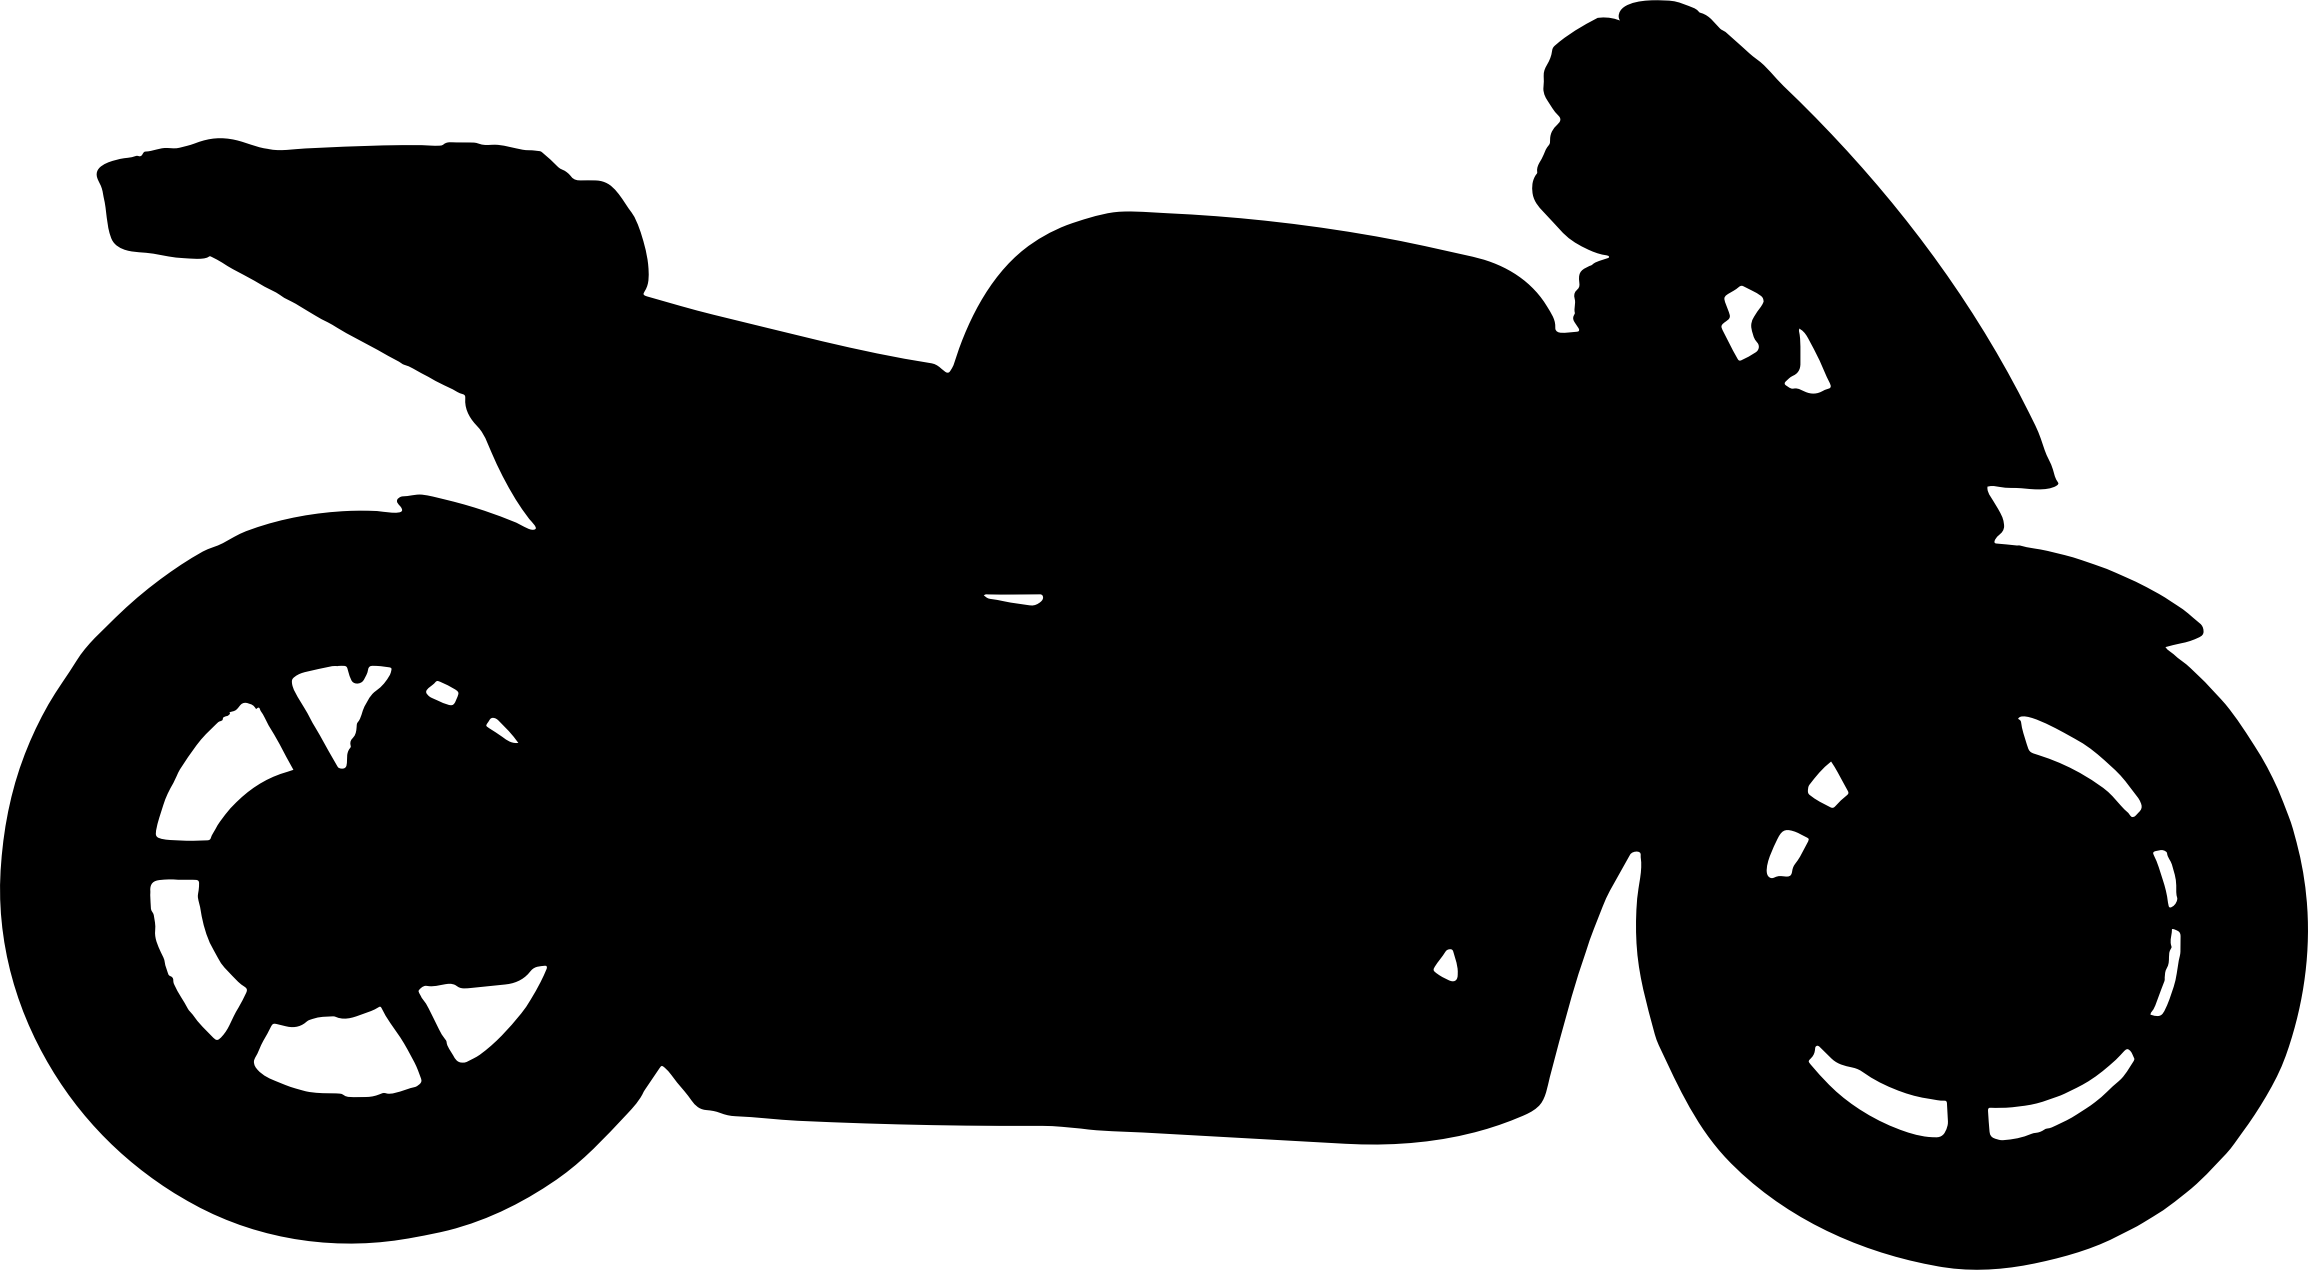 2308x1270 Clipart